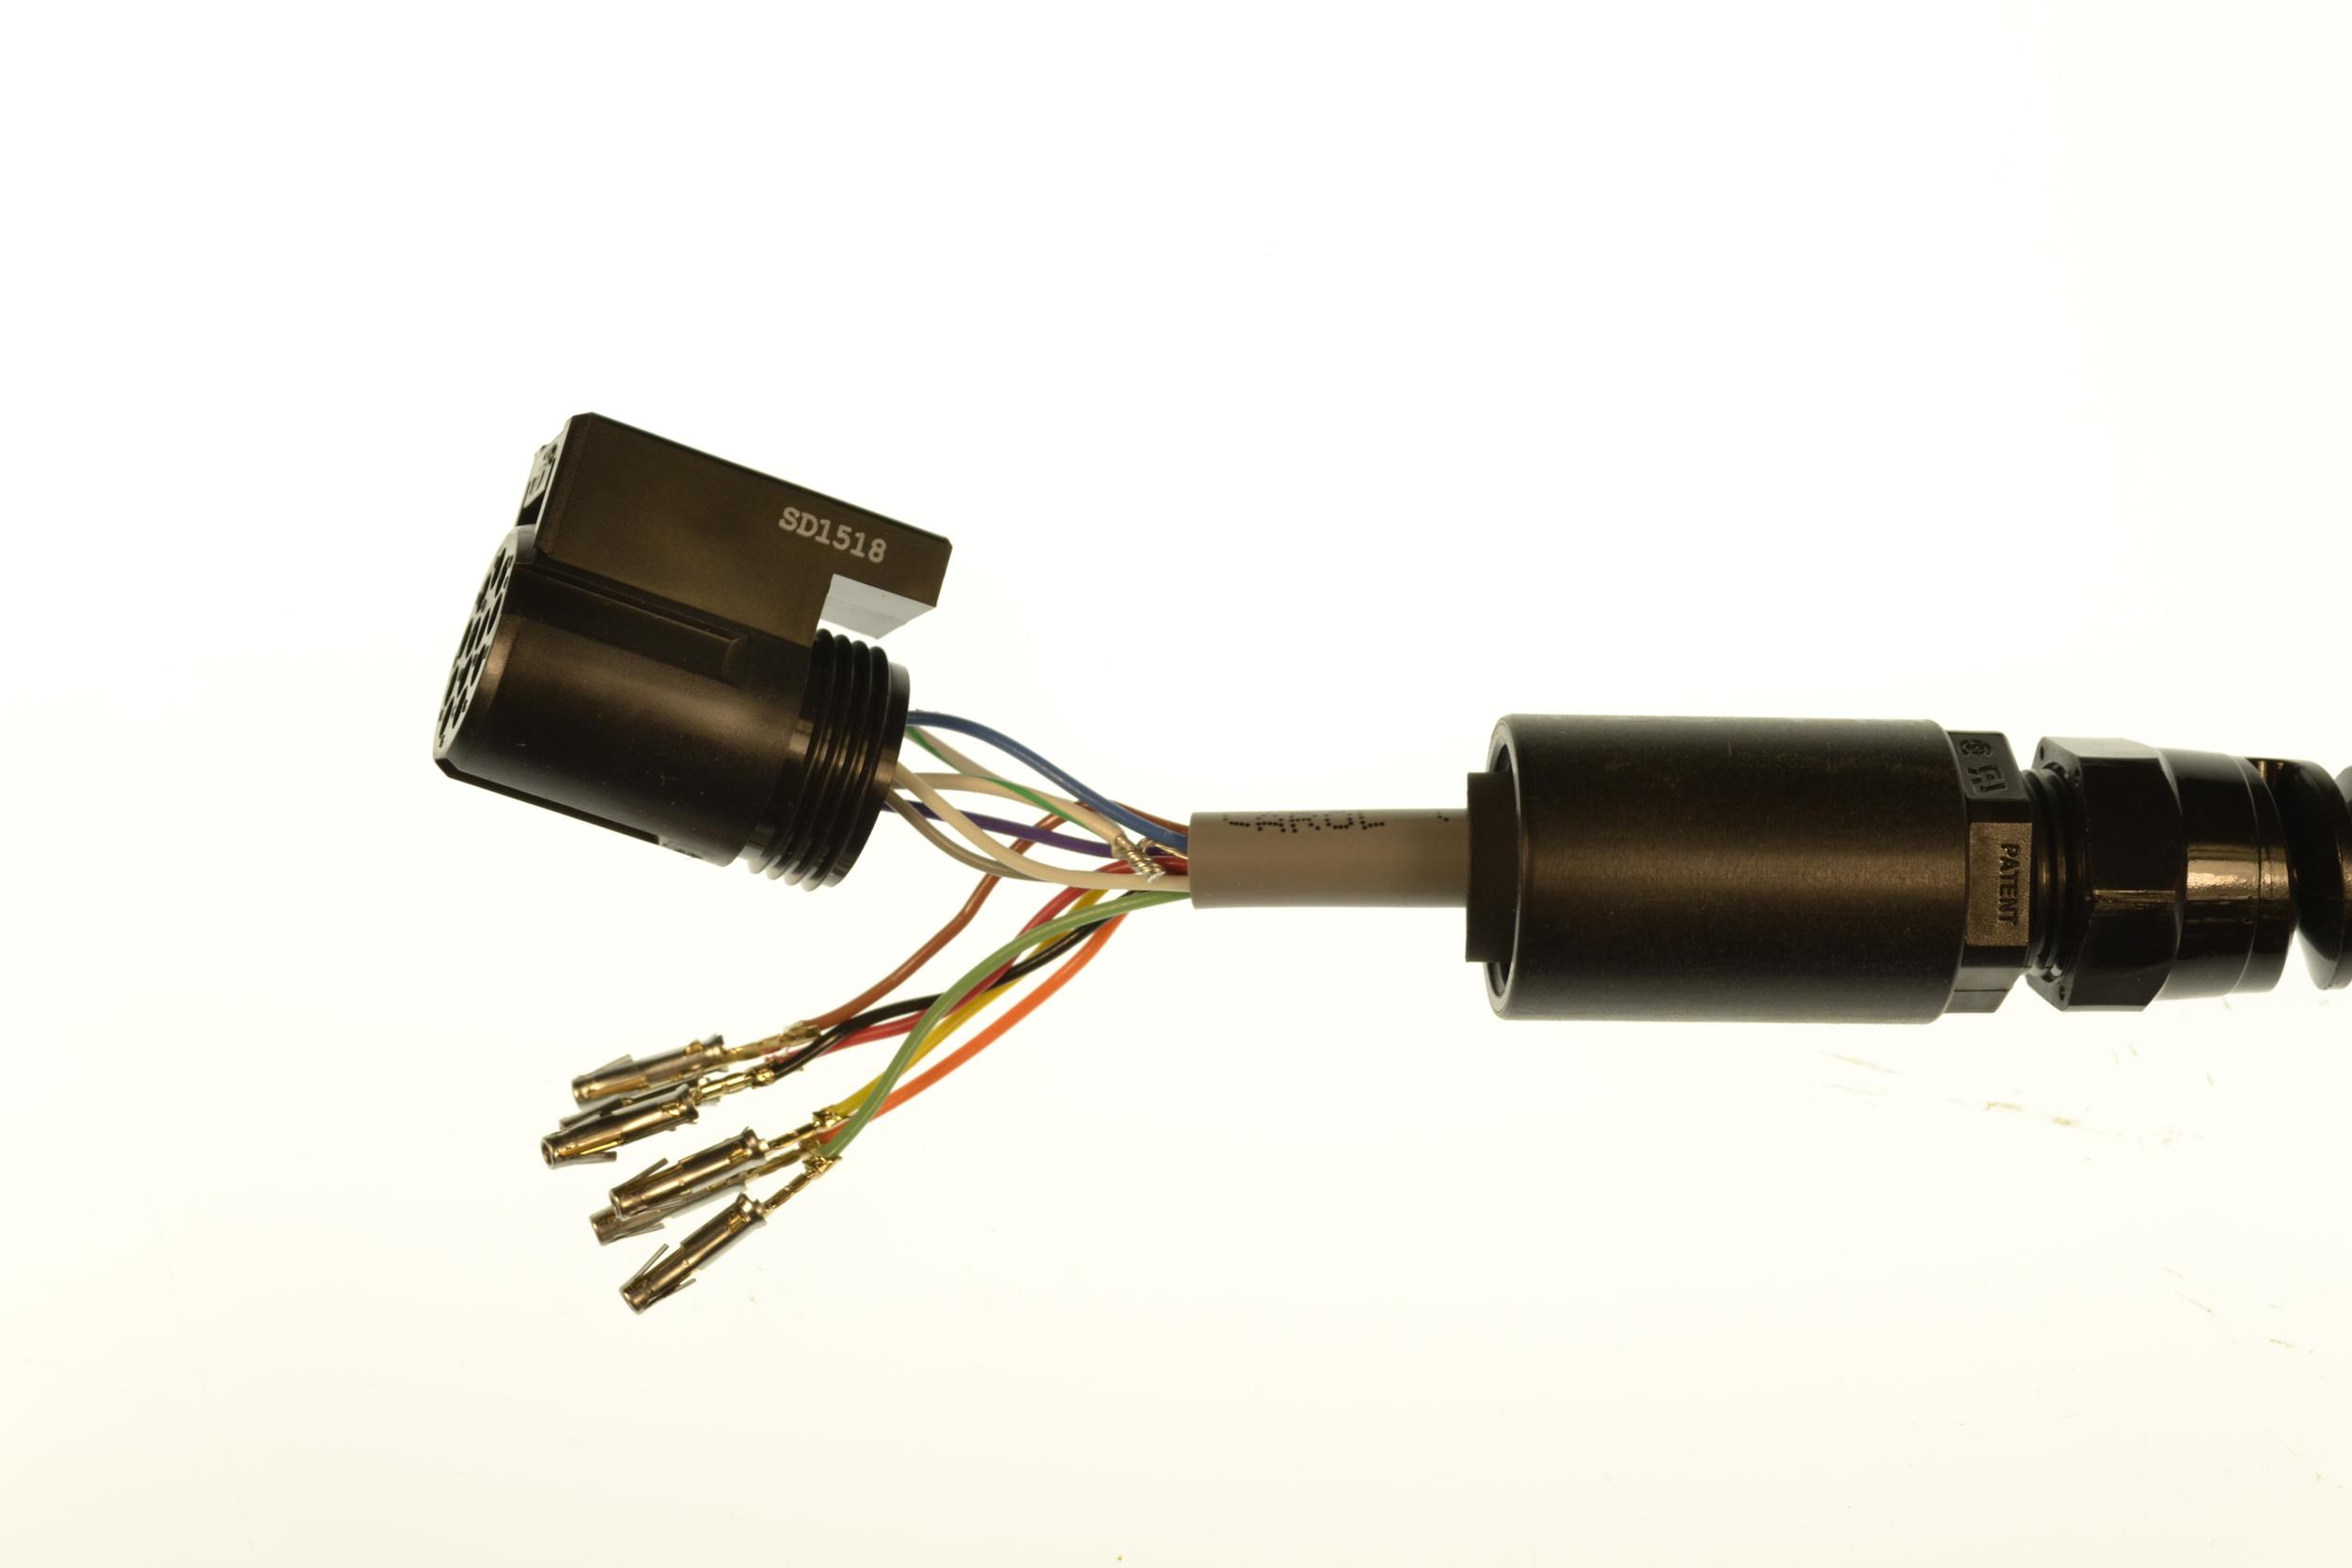 half plugged connector.jpg